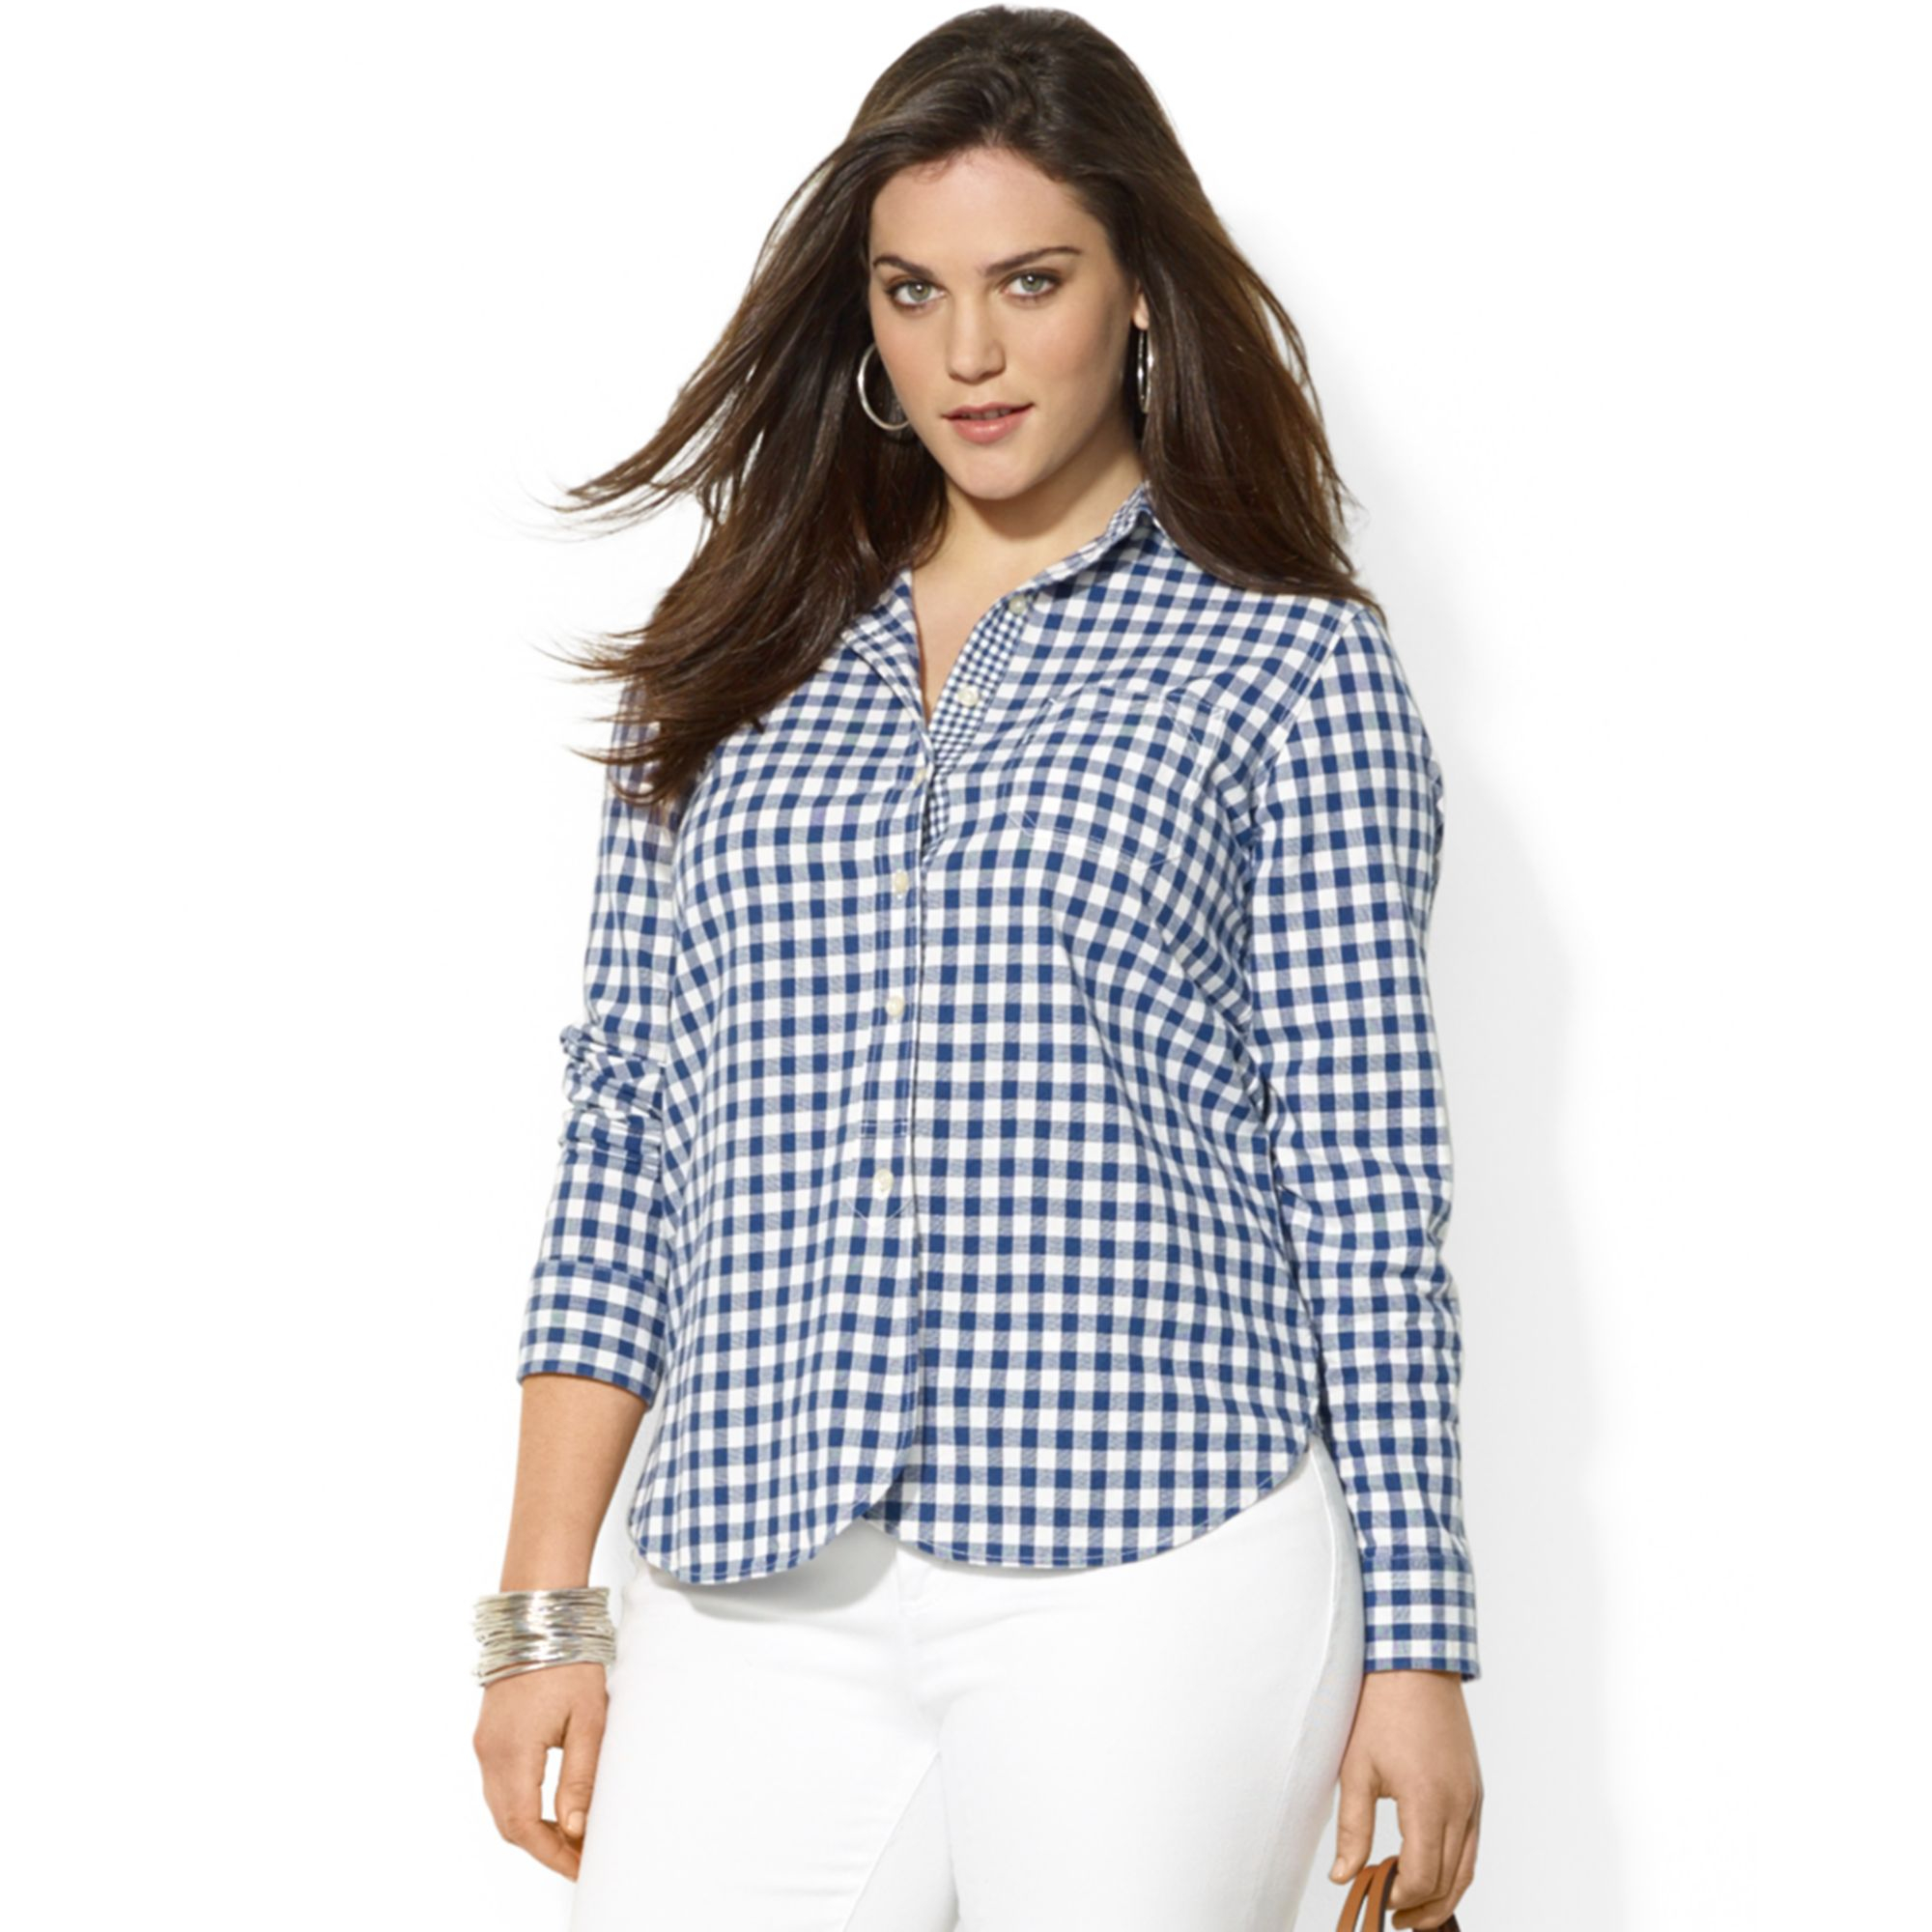 dbbe11e3a2c Lyst - Lauren by Ralph Lauren Plus Size Contrast Cuff Gingham Shirt ...